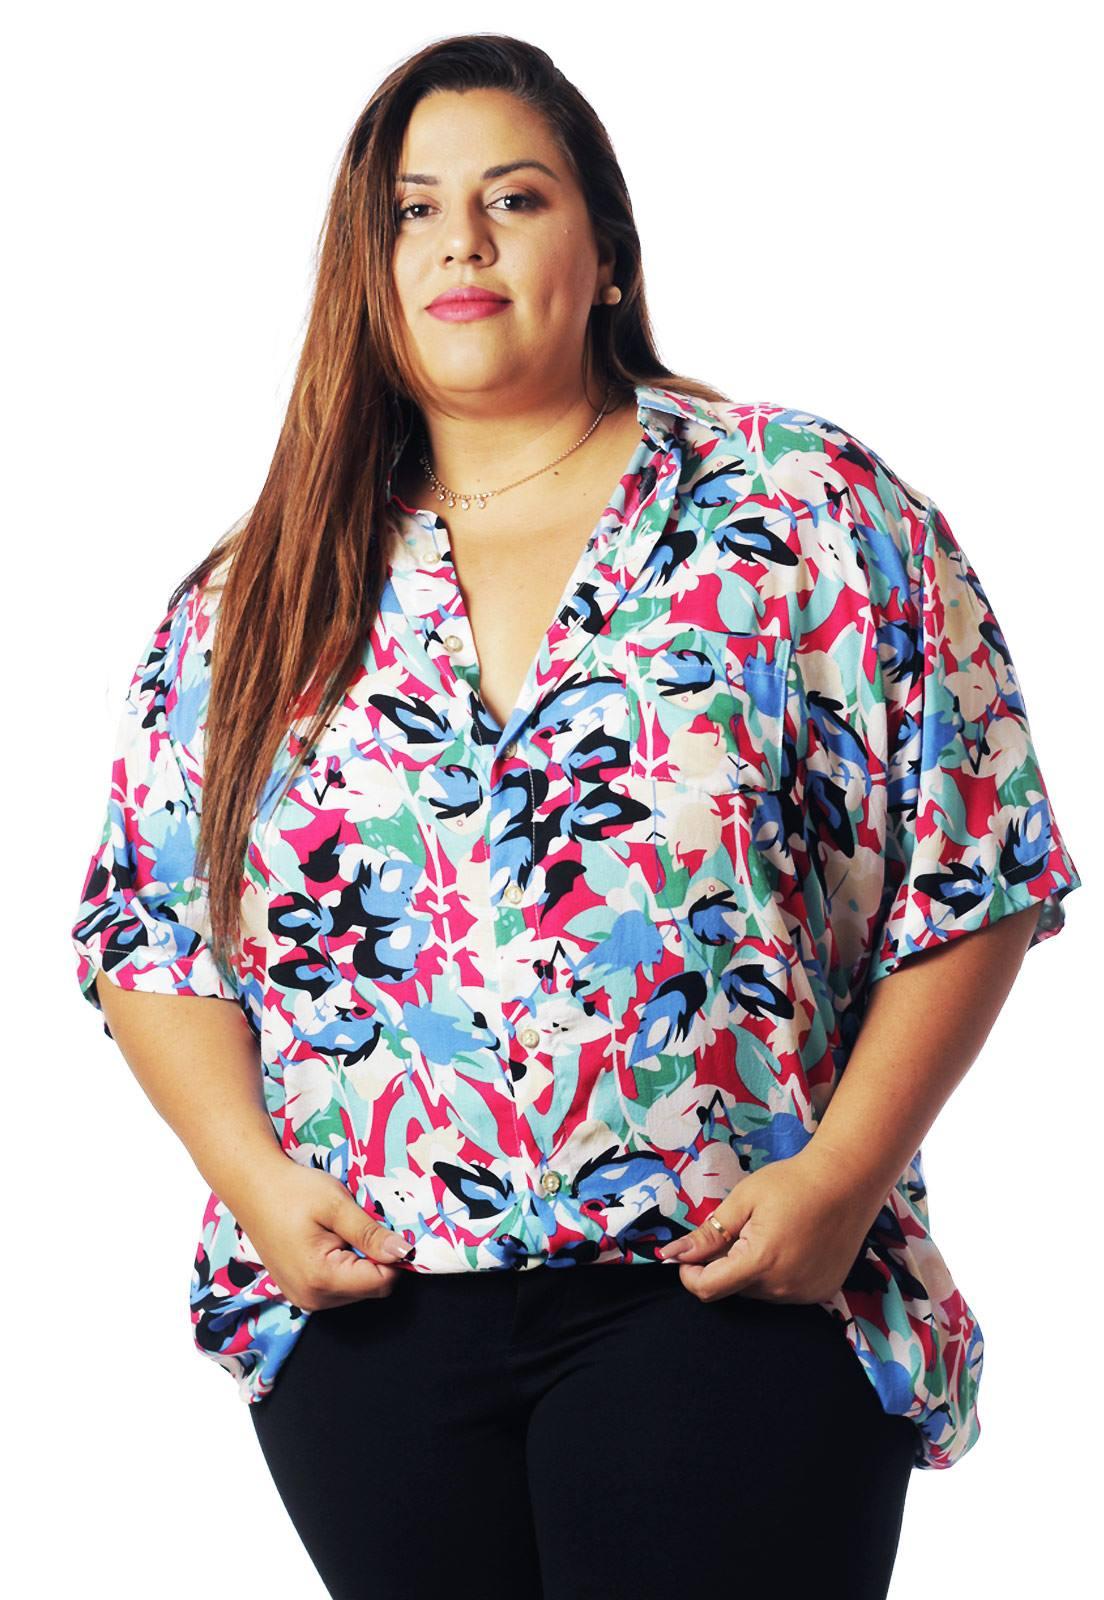 Camisa Plus Size Estampada Viscose Cherry Pop Artsy (P Ao Plus Size)